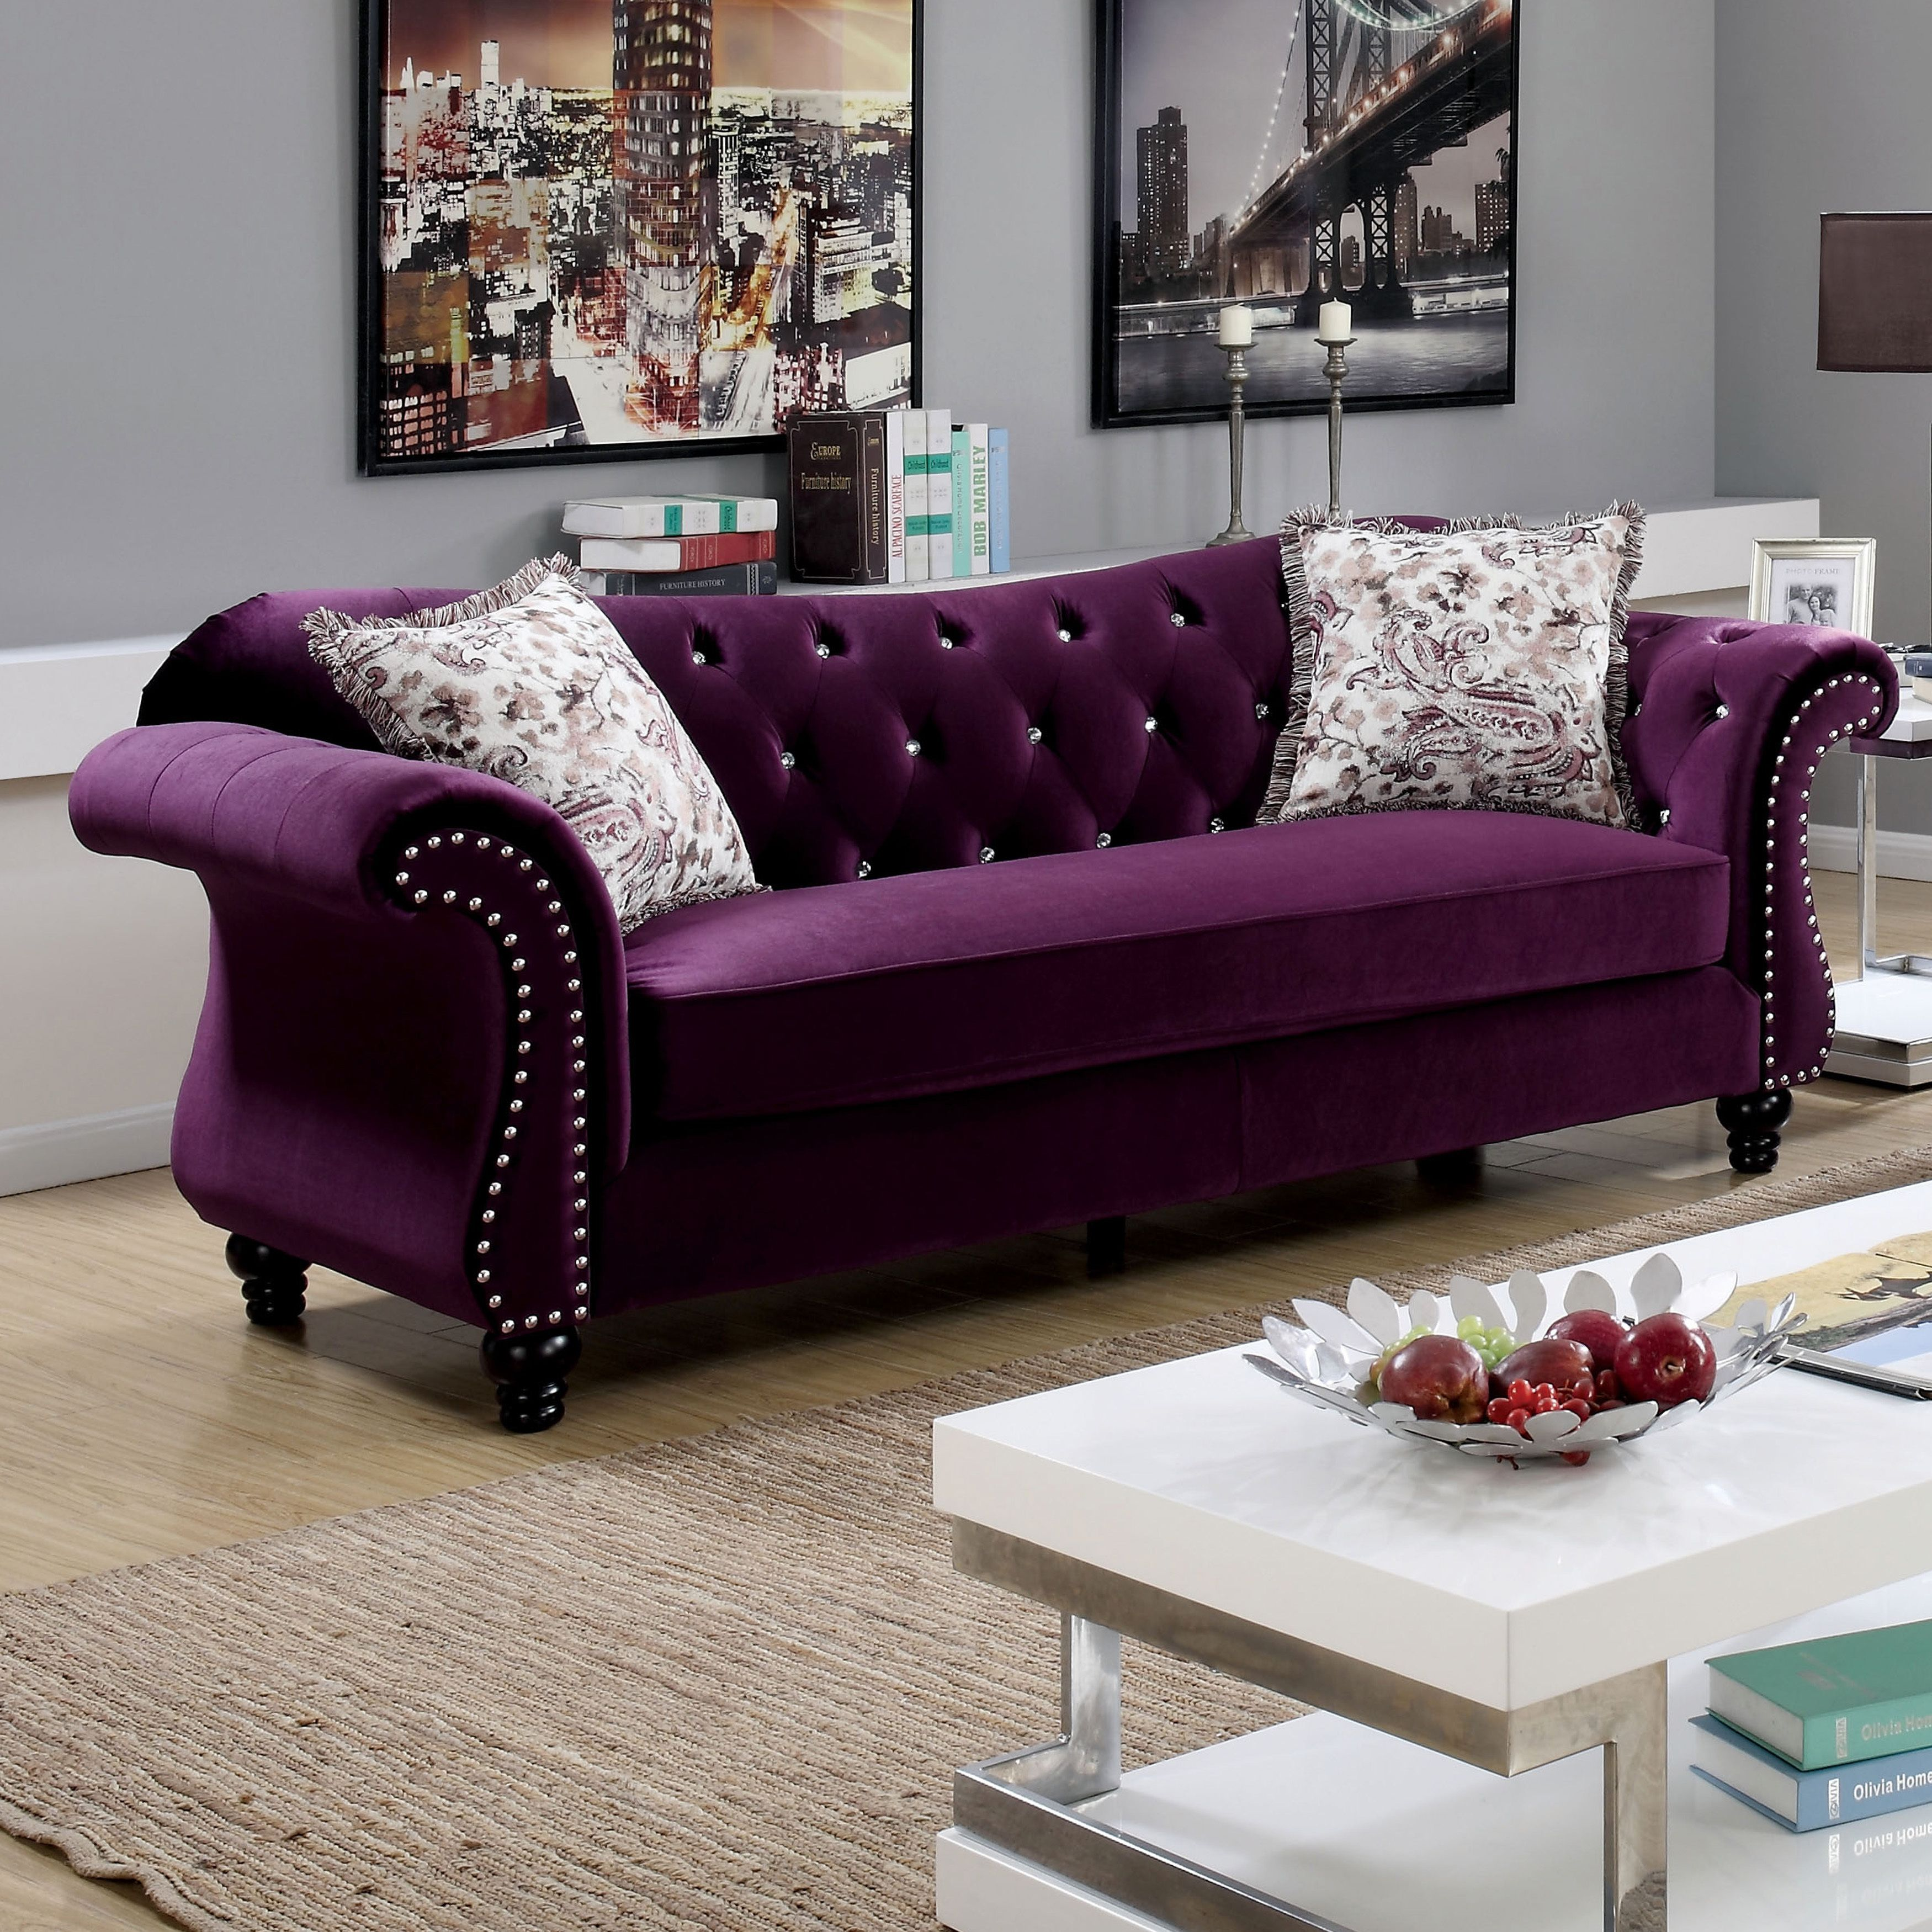 Furniture of america dessie traditional tufted sofa grey decor